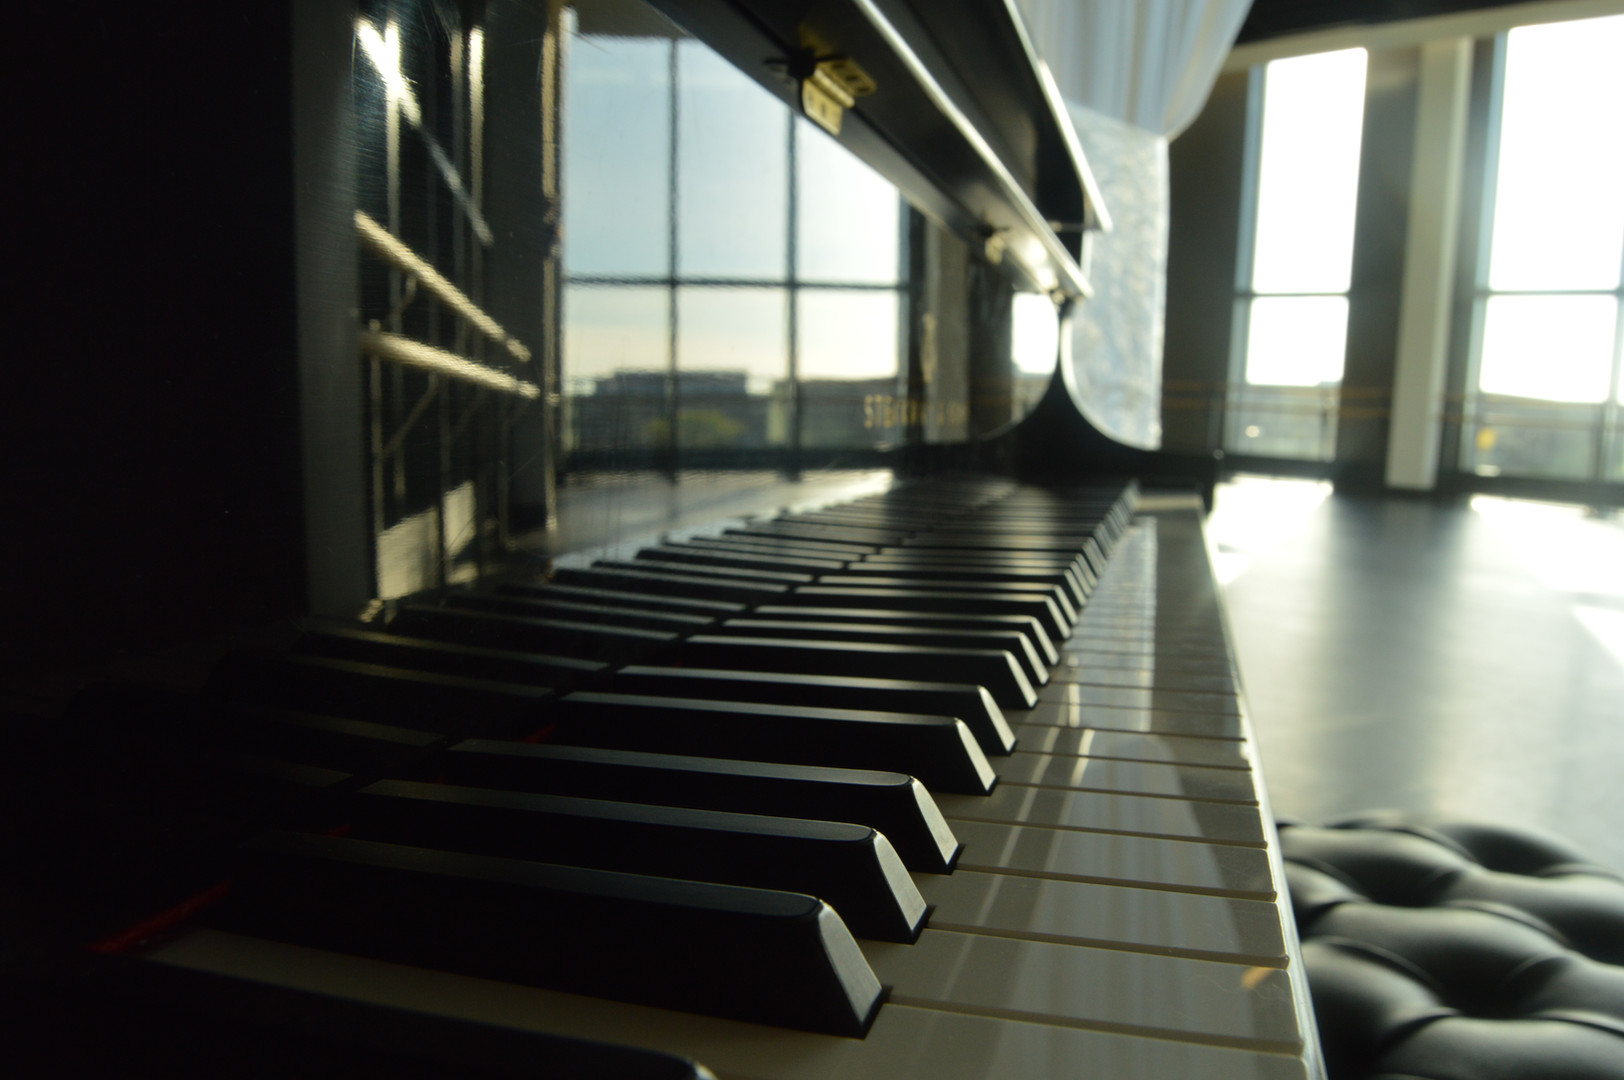 Piano at Merrins Dance Theatre